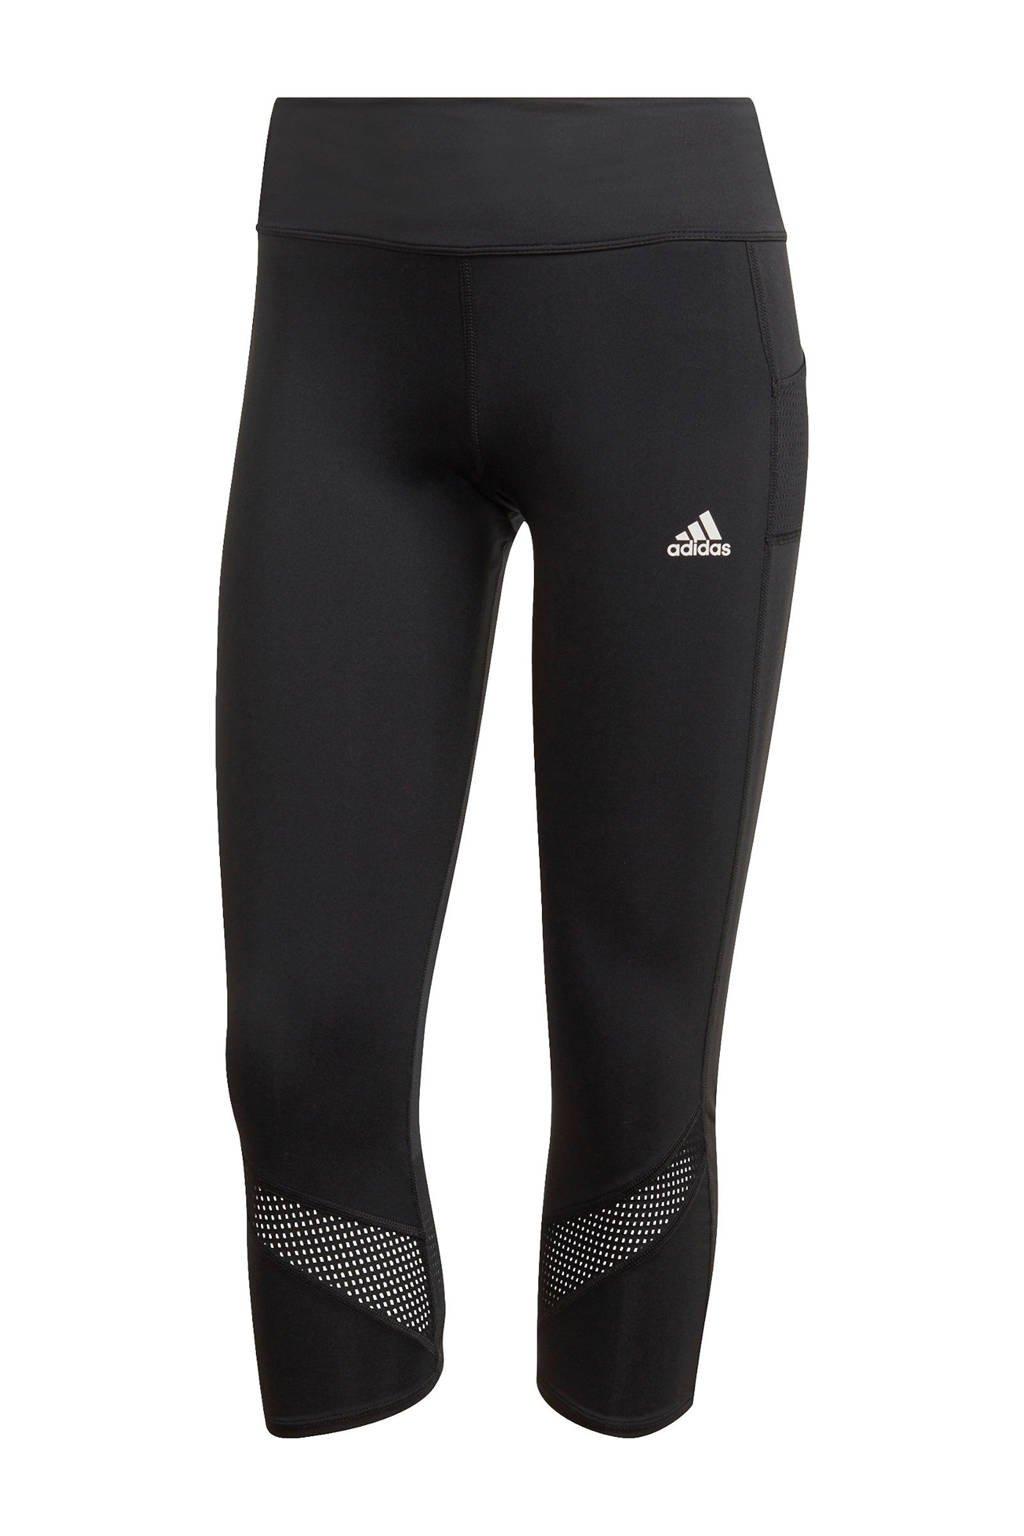 adidas Performance 3/4 hardloopbroek zwart, Zwart